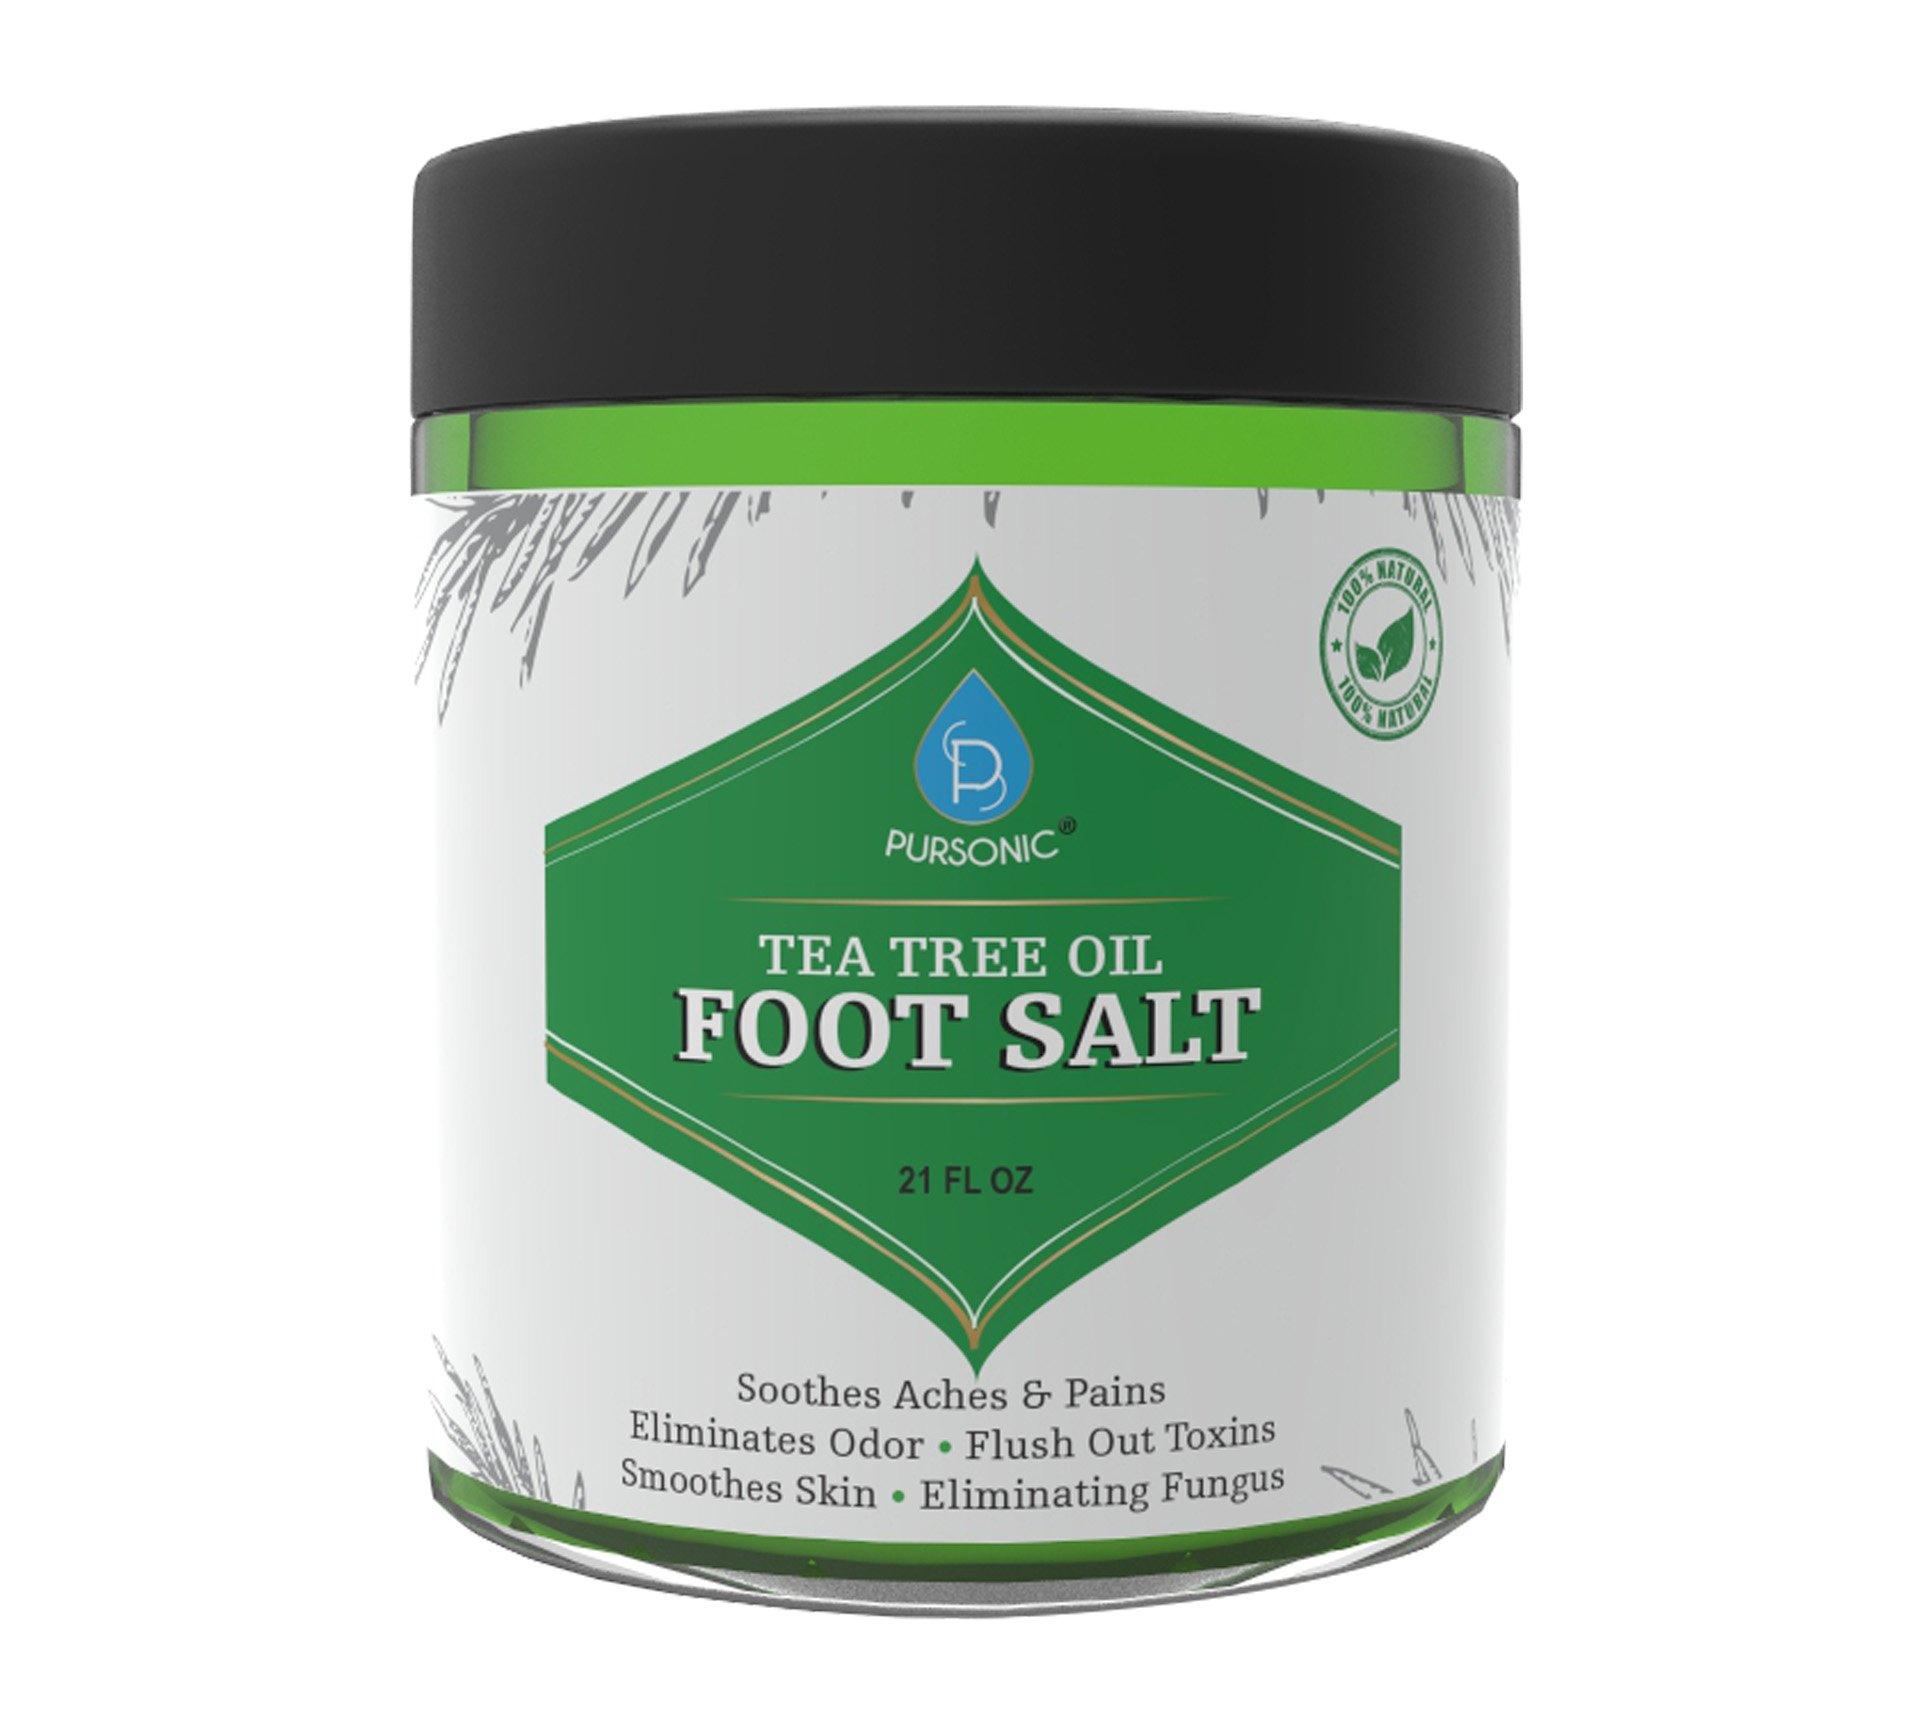 Pursonic Tea Tree Oil Foot Soak With Epsom Salt,Helps Soak Away Toenail Fungus, Athletes Foot & Stubborn Foot Odor – Softens Calluses & Soothes Sore Tired Feet, 21oz